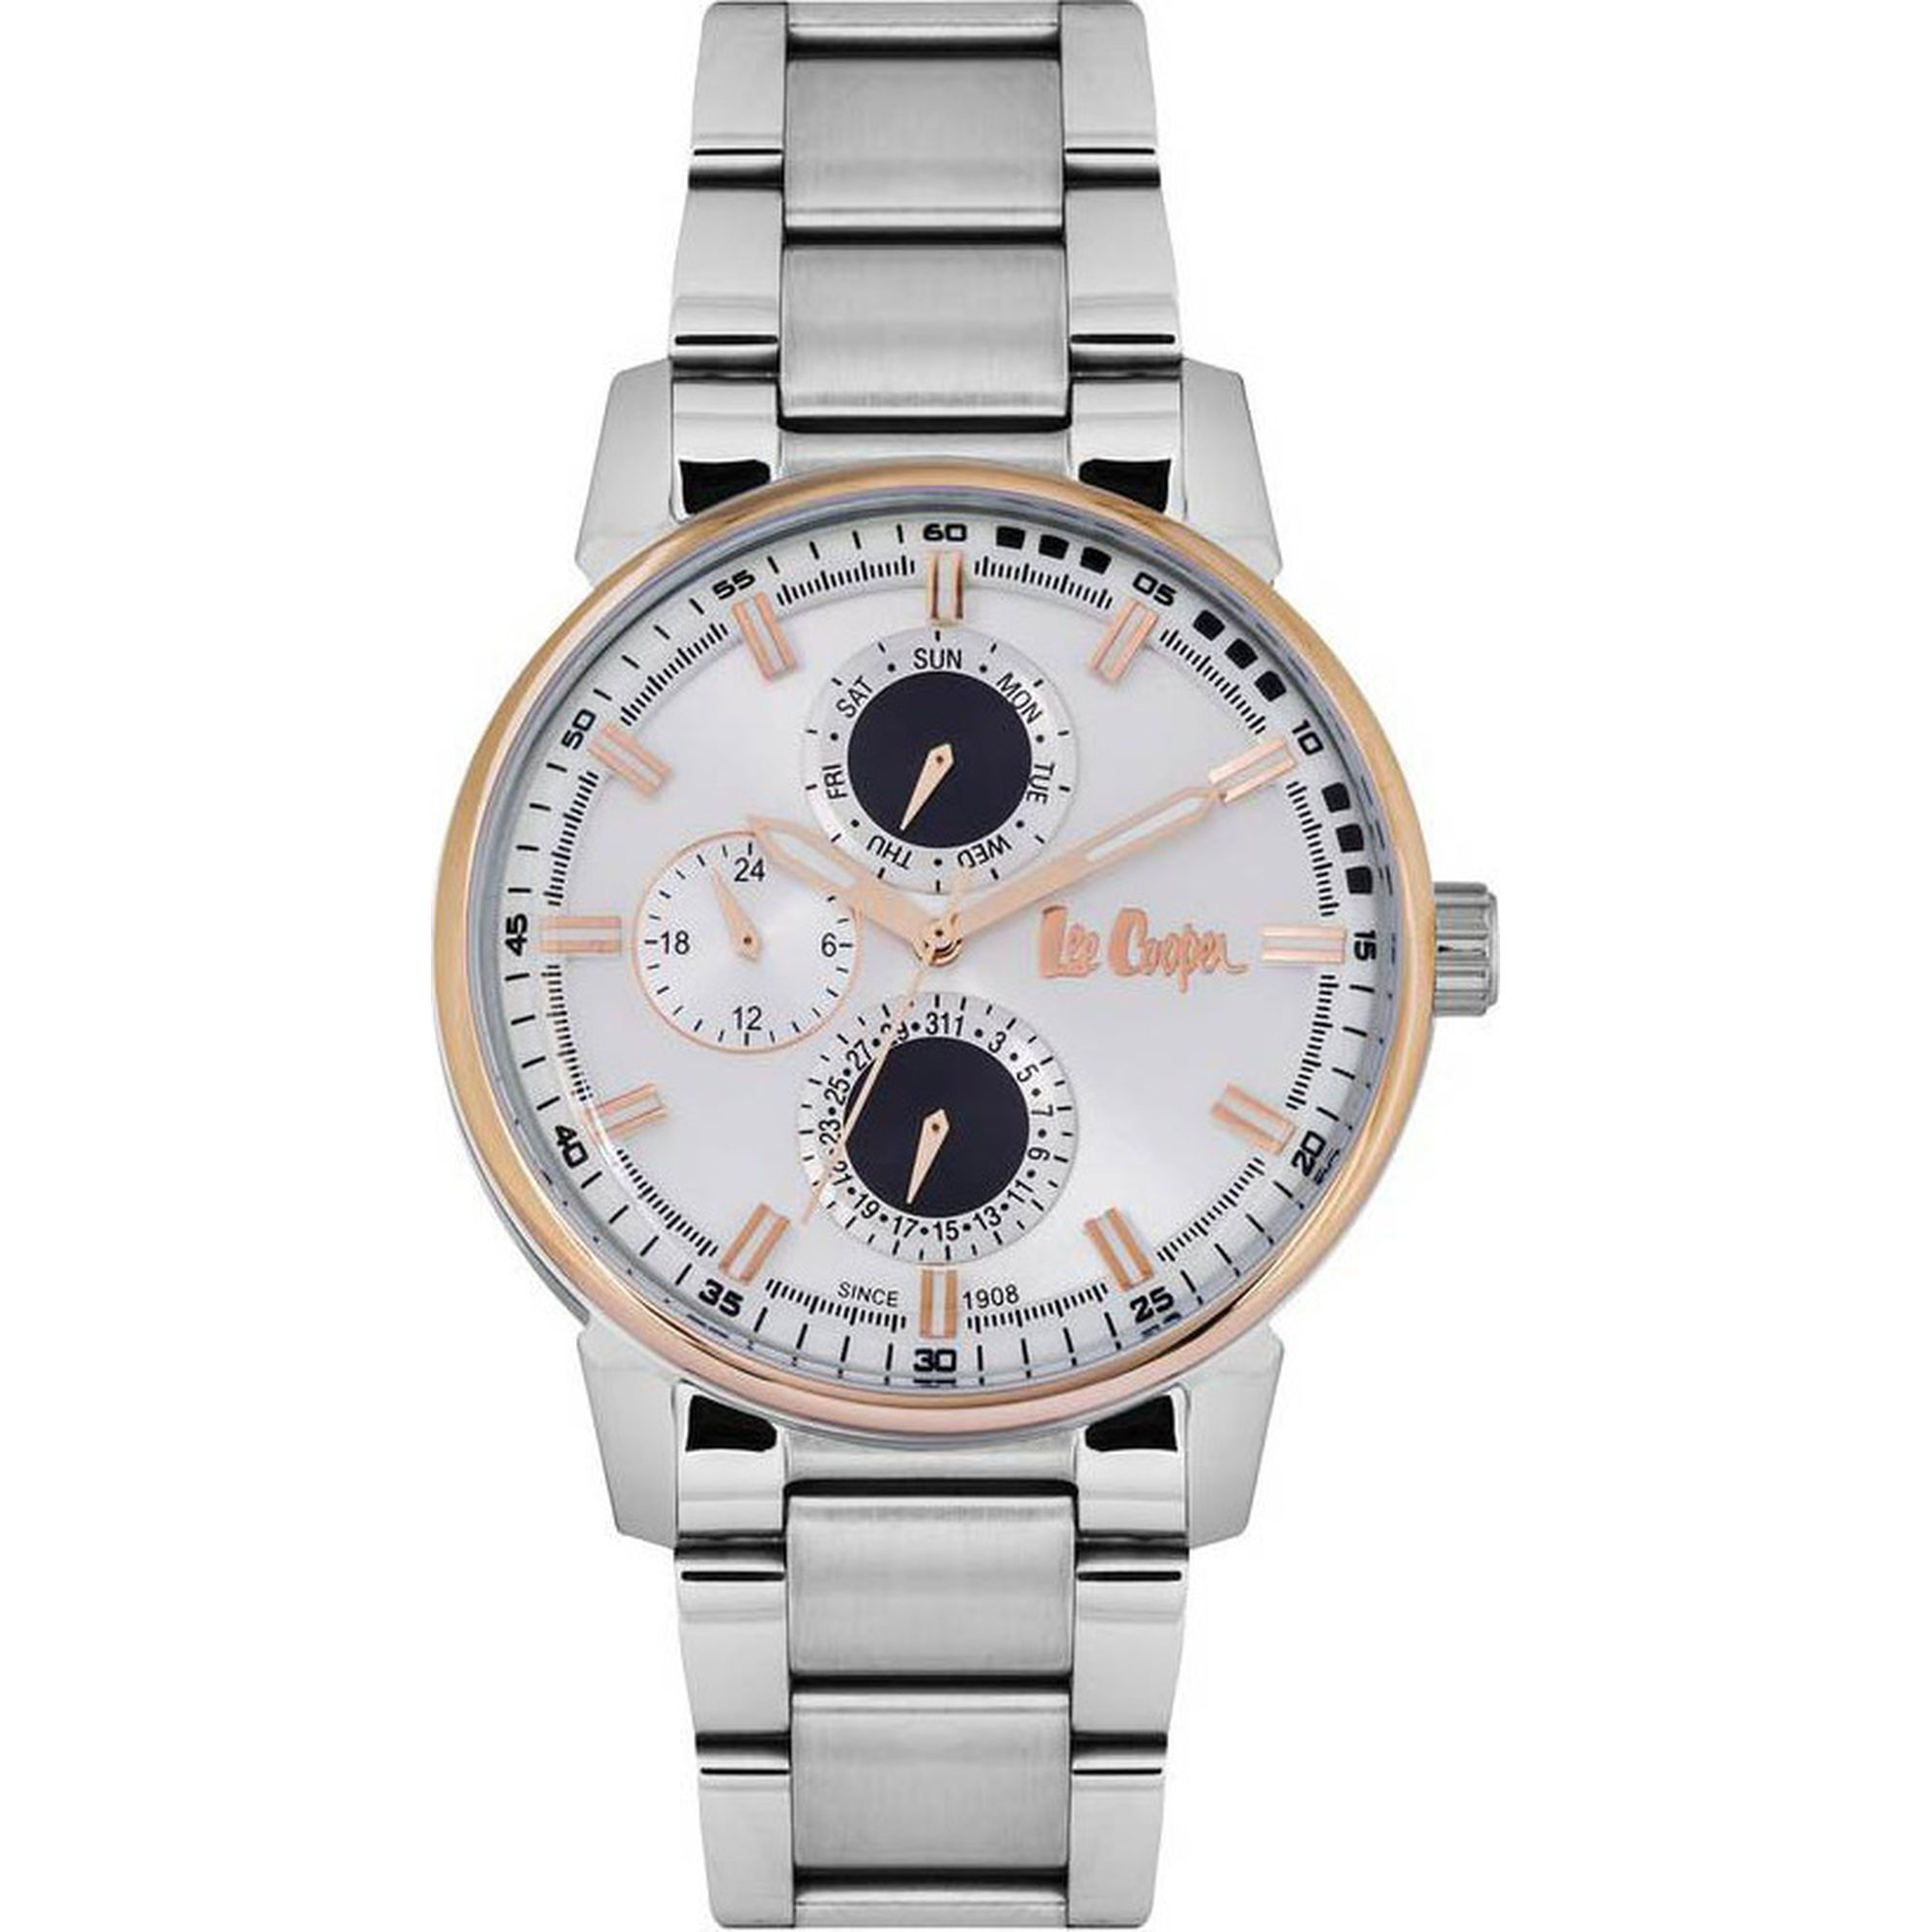 Lee Cooper Ρολόι 44mm Λευκό Καντράν και Μπασελέ LC06581.530, ρολόι, ρολόγια, Ανδρικά ρολόγια, Lee Cooper,Δωρεάν μεταφορικά